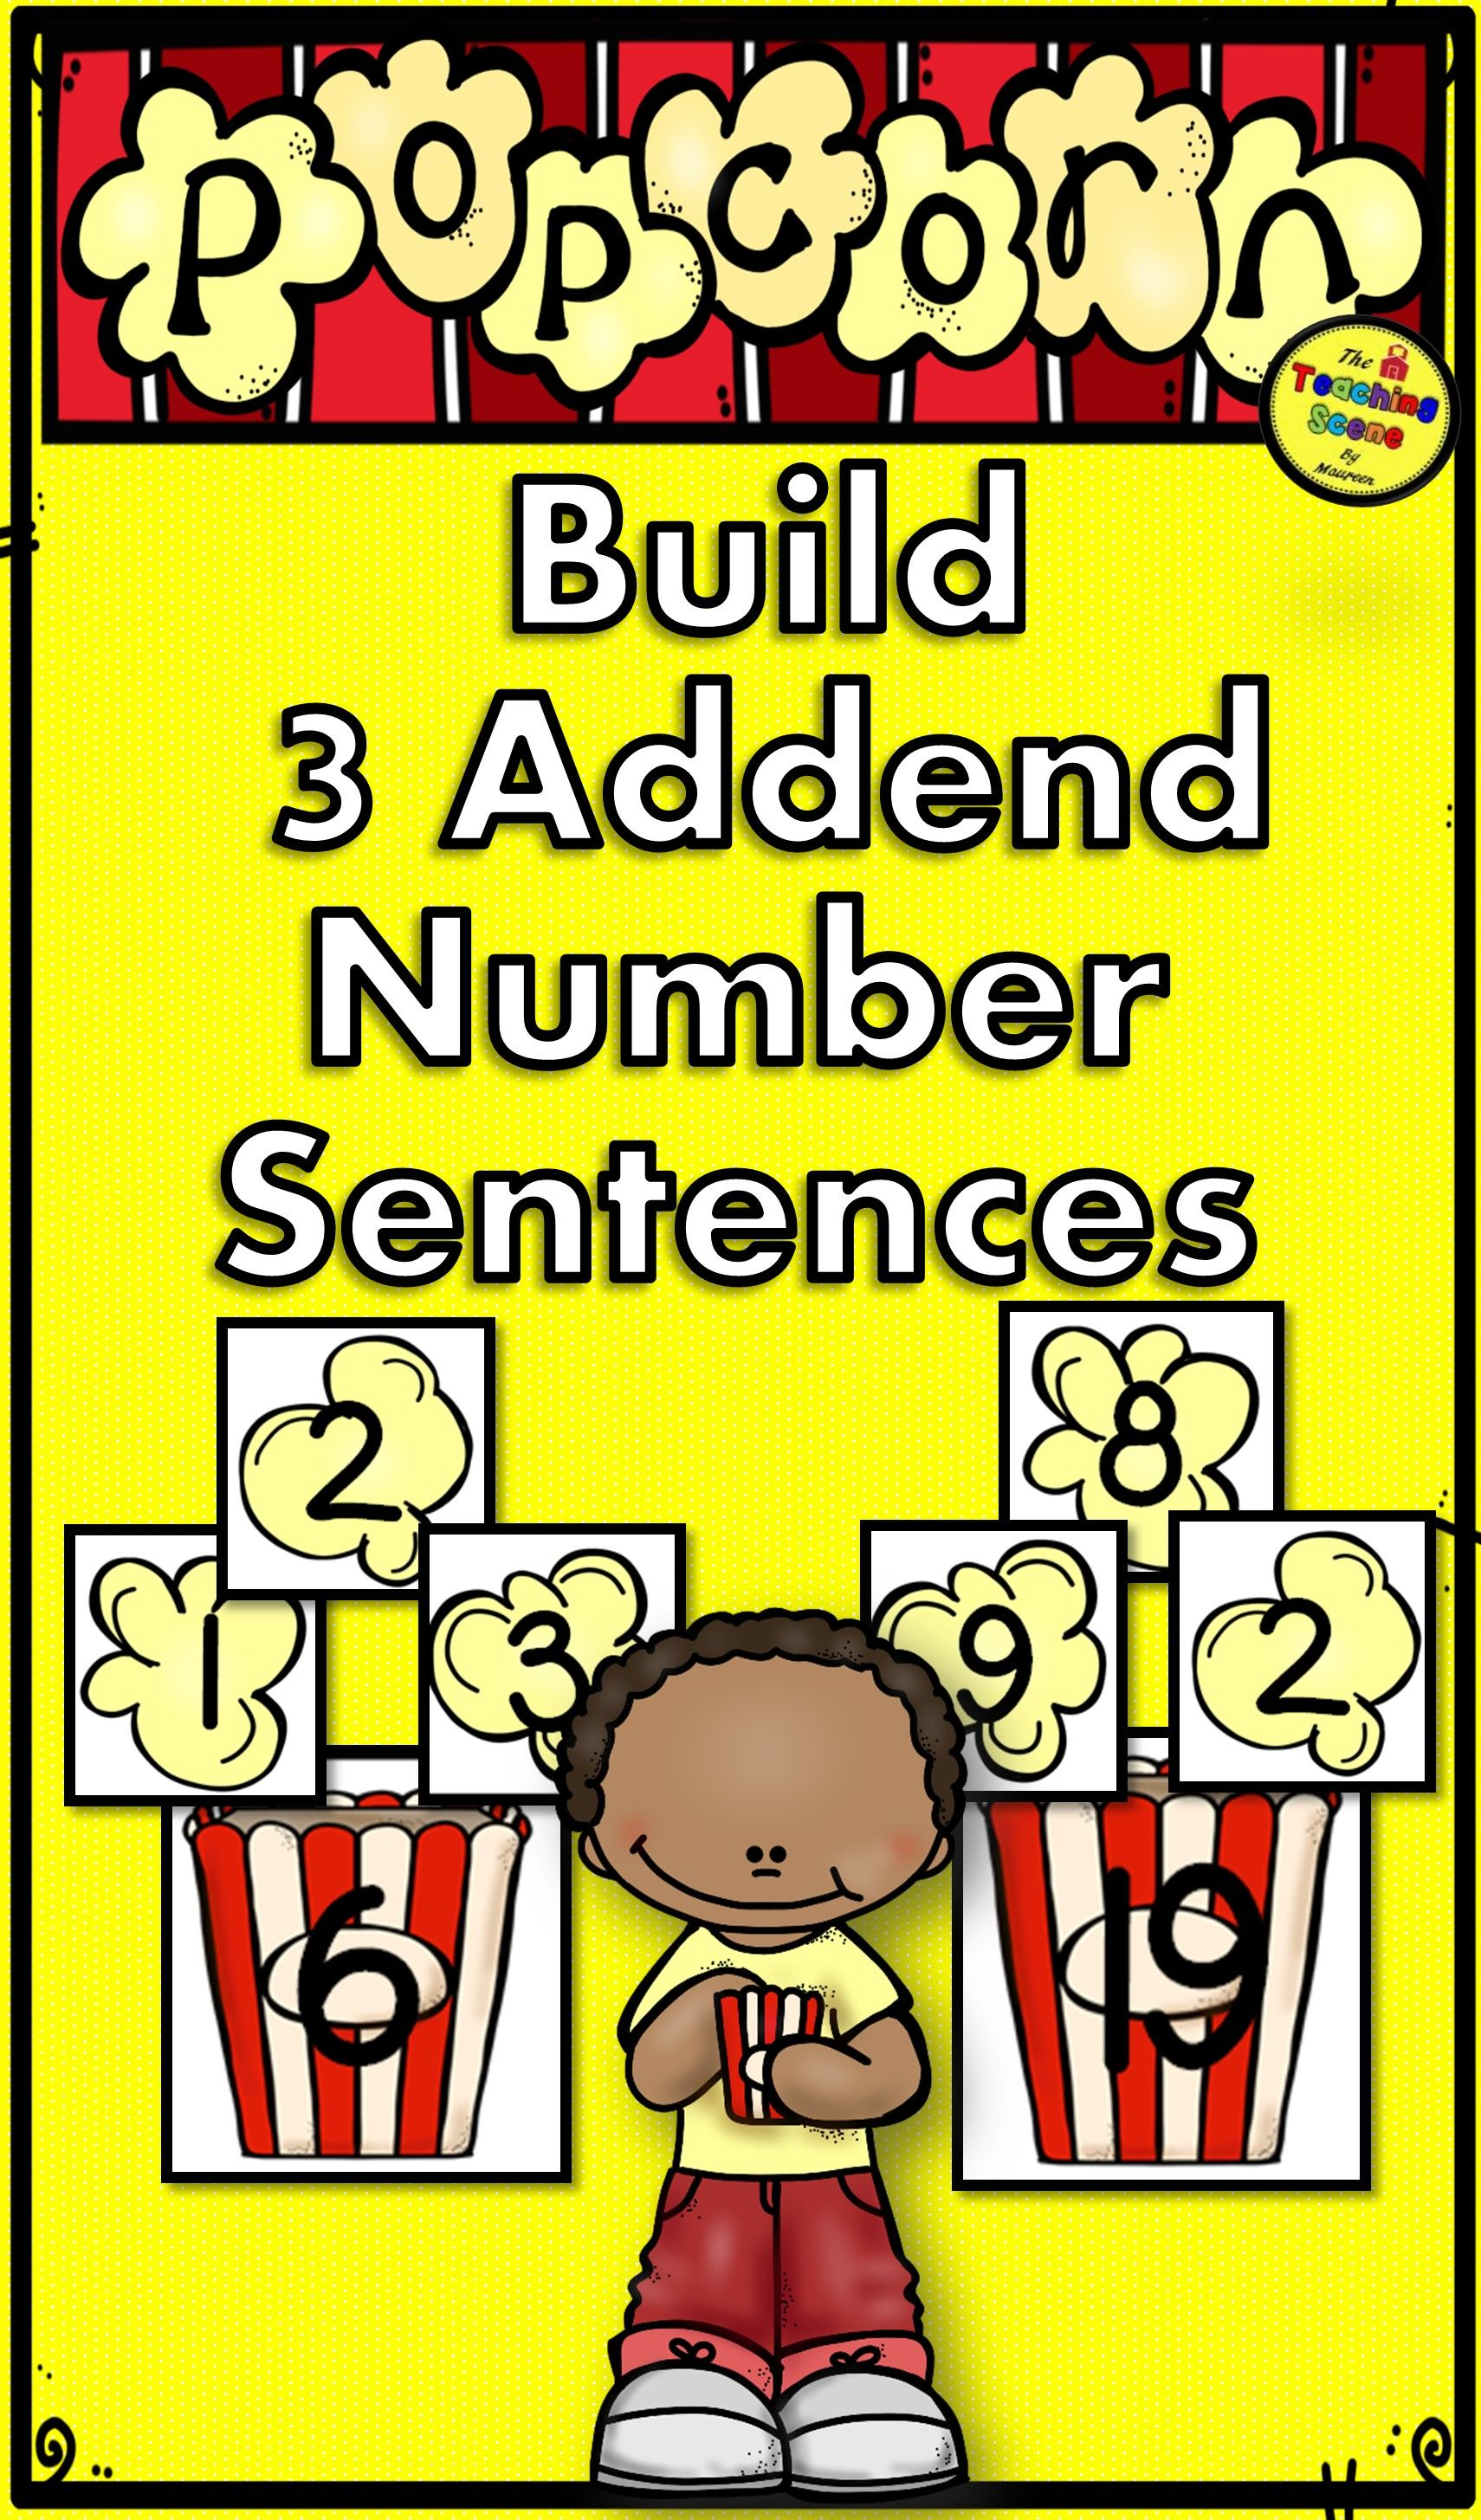 Popcorn Build 3 Addend Addition Amp Subtraction Sentences